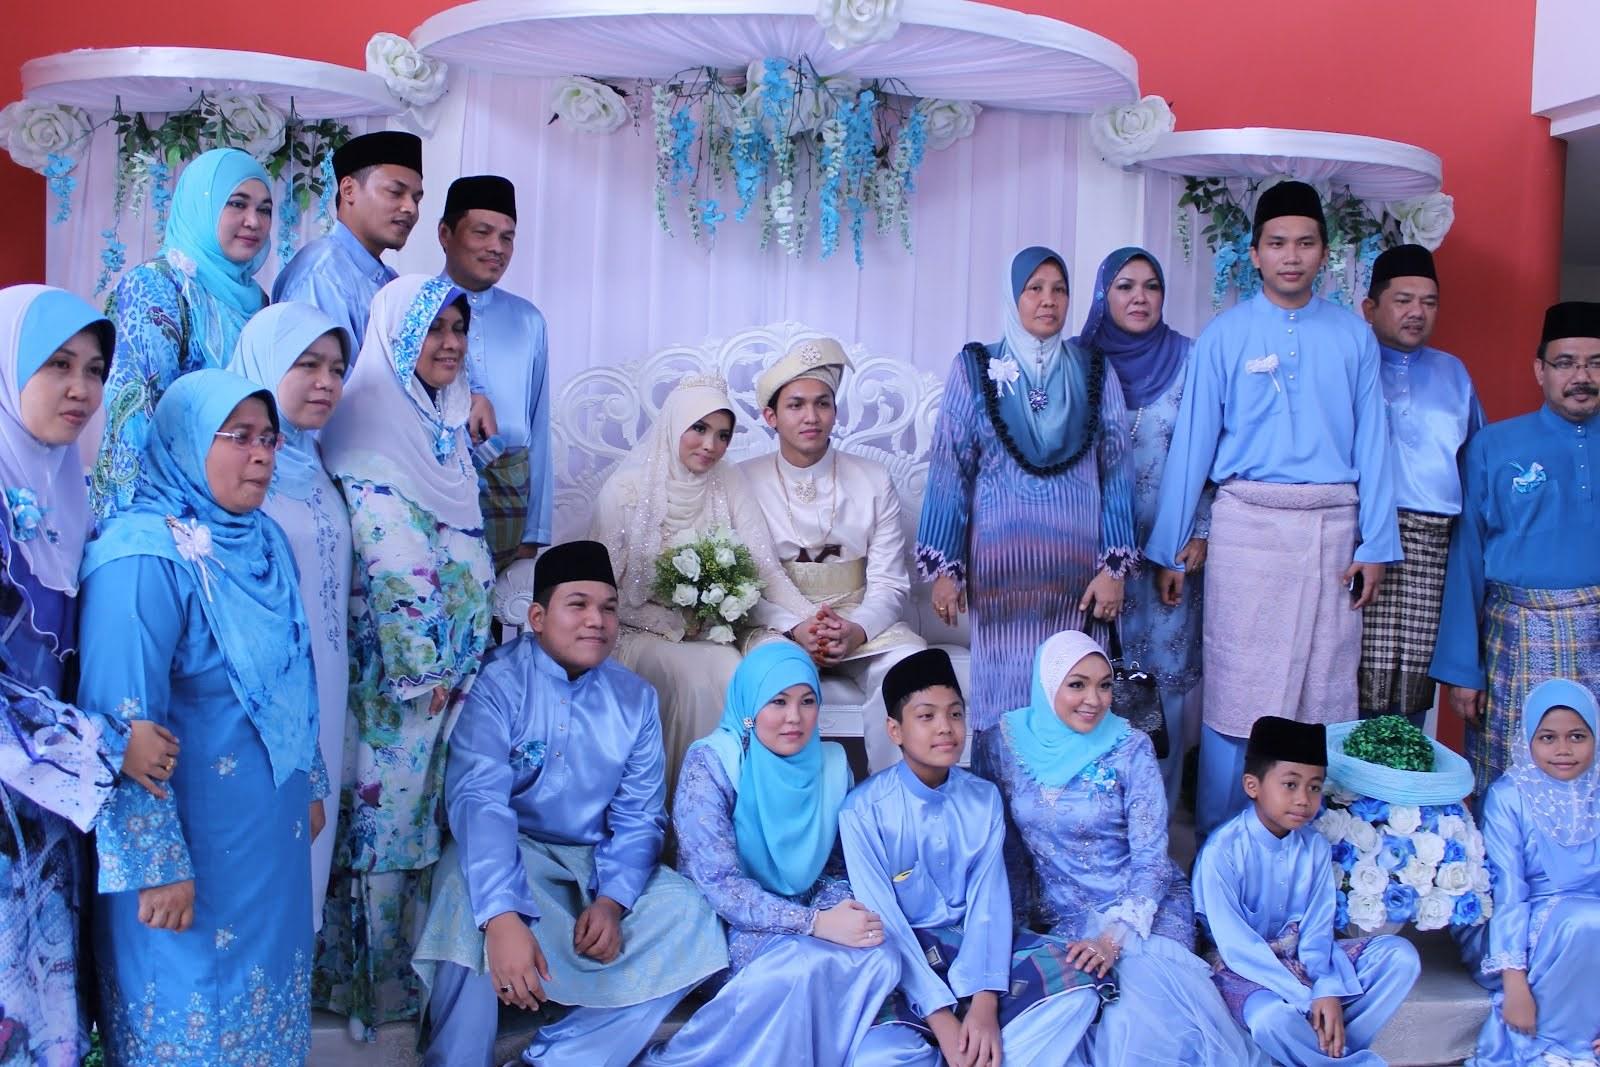 Inspirasi Baju Lebaran Keluarga Warna Biru J7do 25 Model Baju Lebaran Keluarga Warna Biru Terbaru 2018